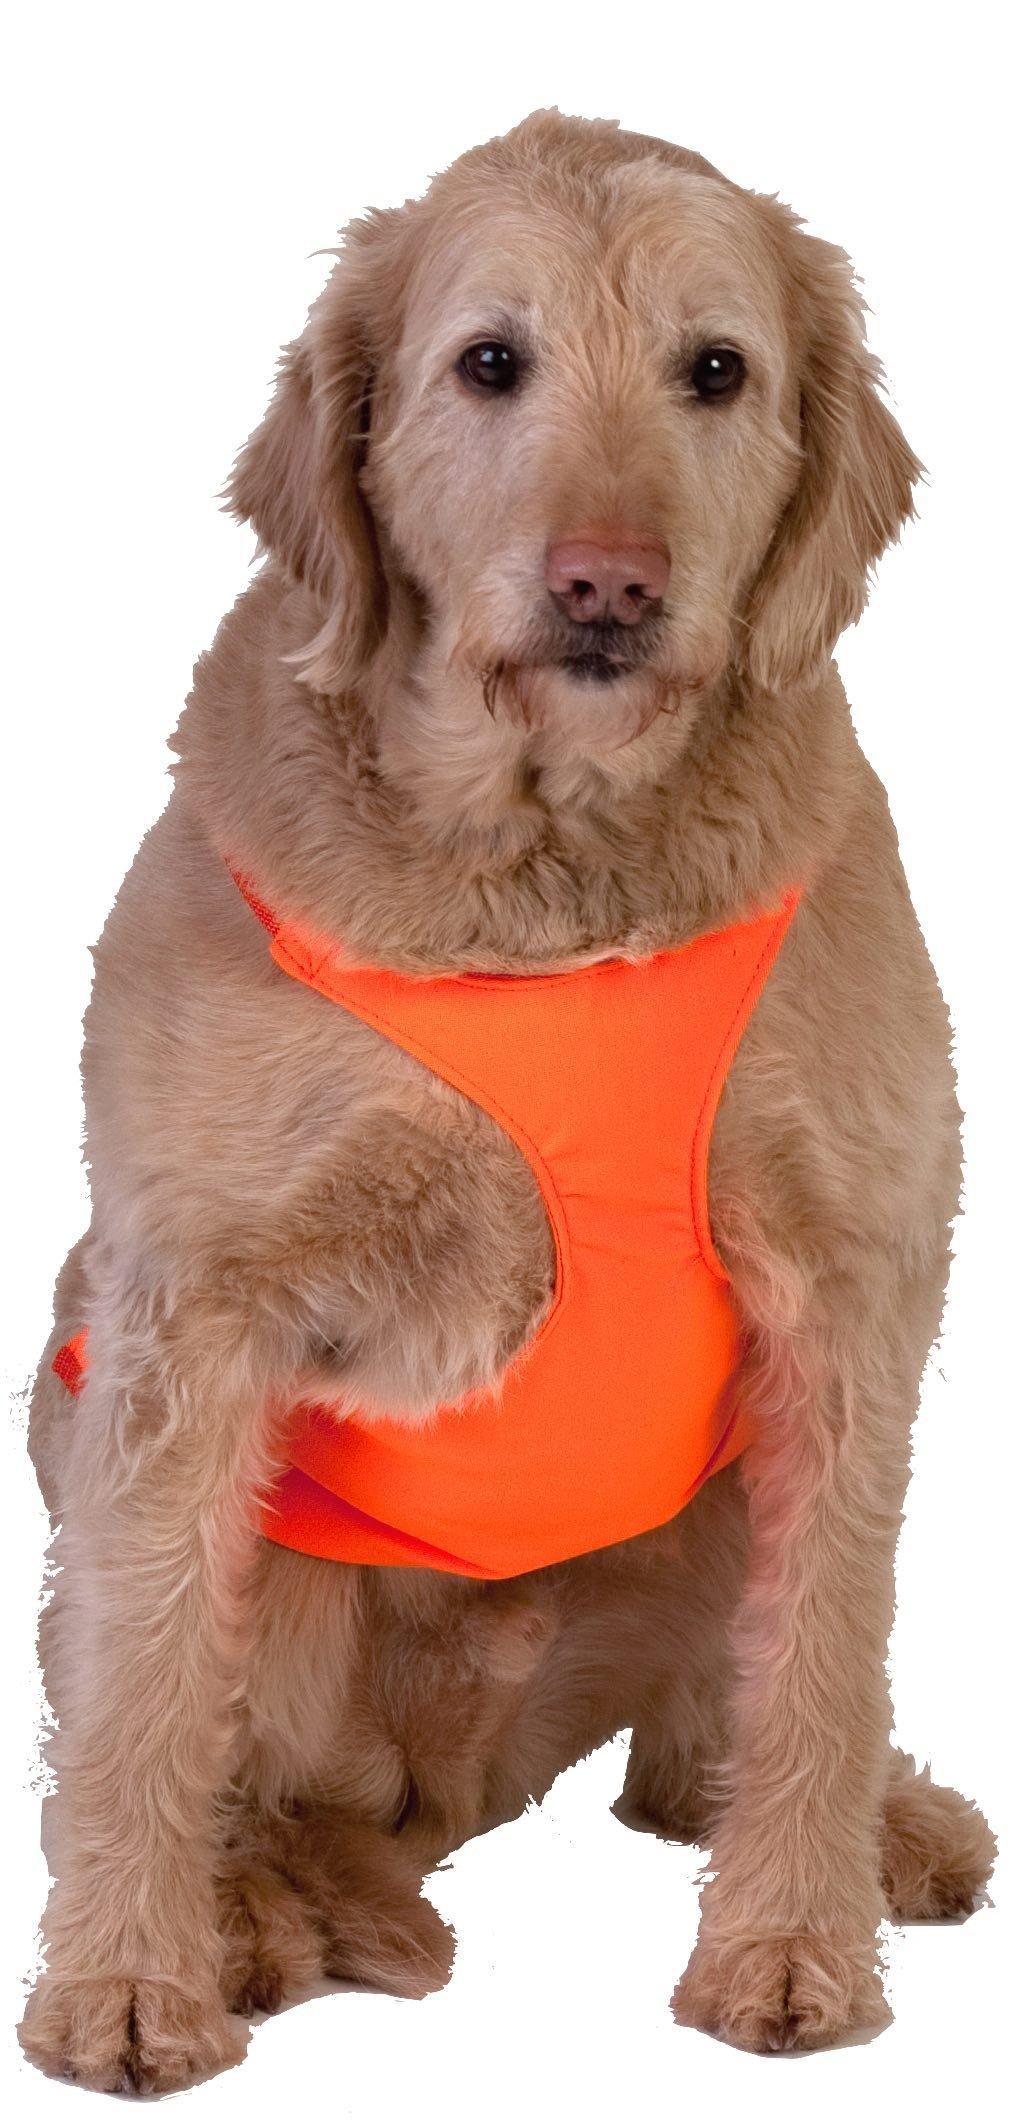 Dog Not Gone No Fly Zone Safety Chest Vest, Large, Orange